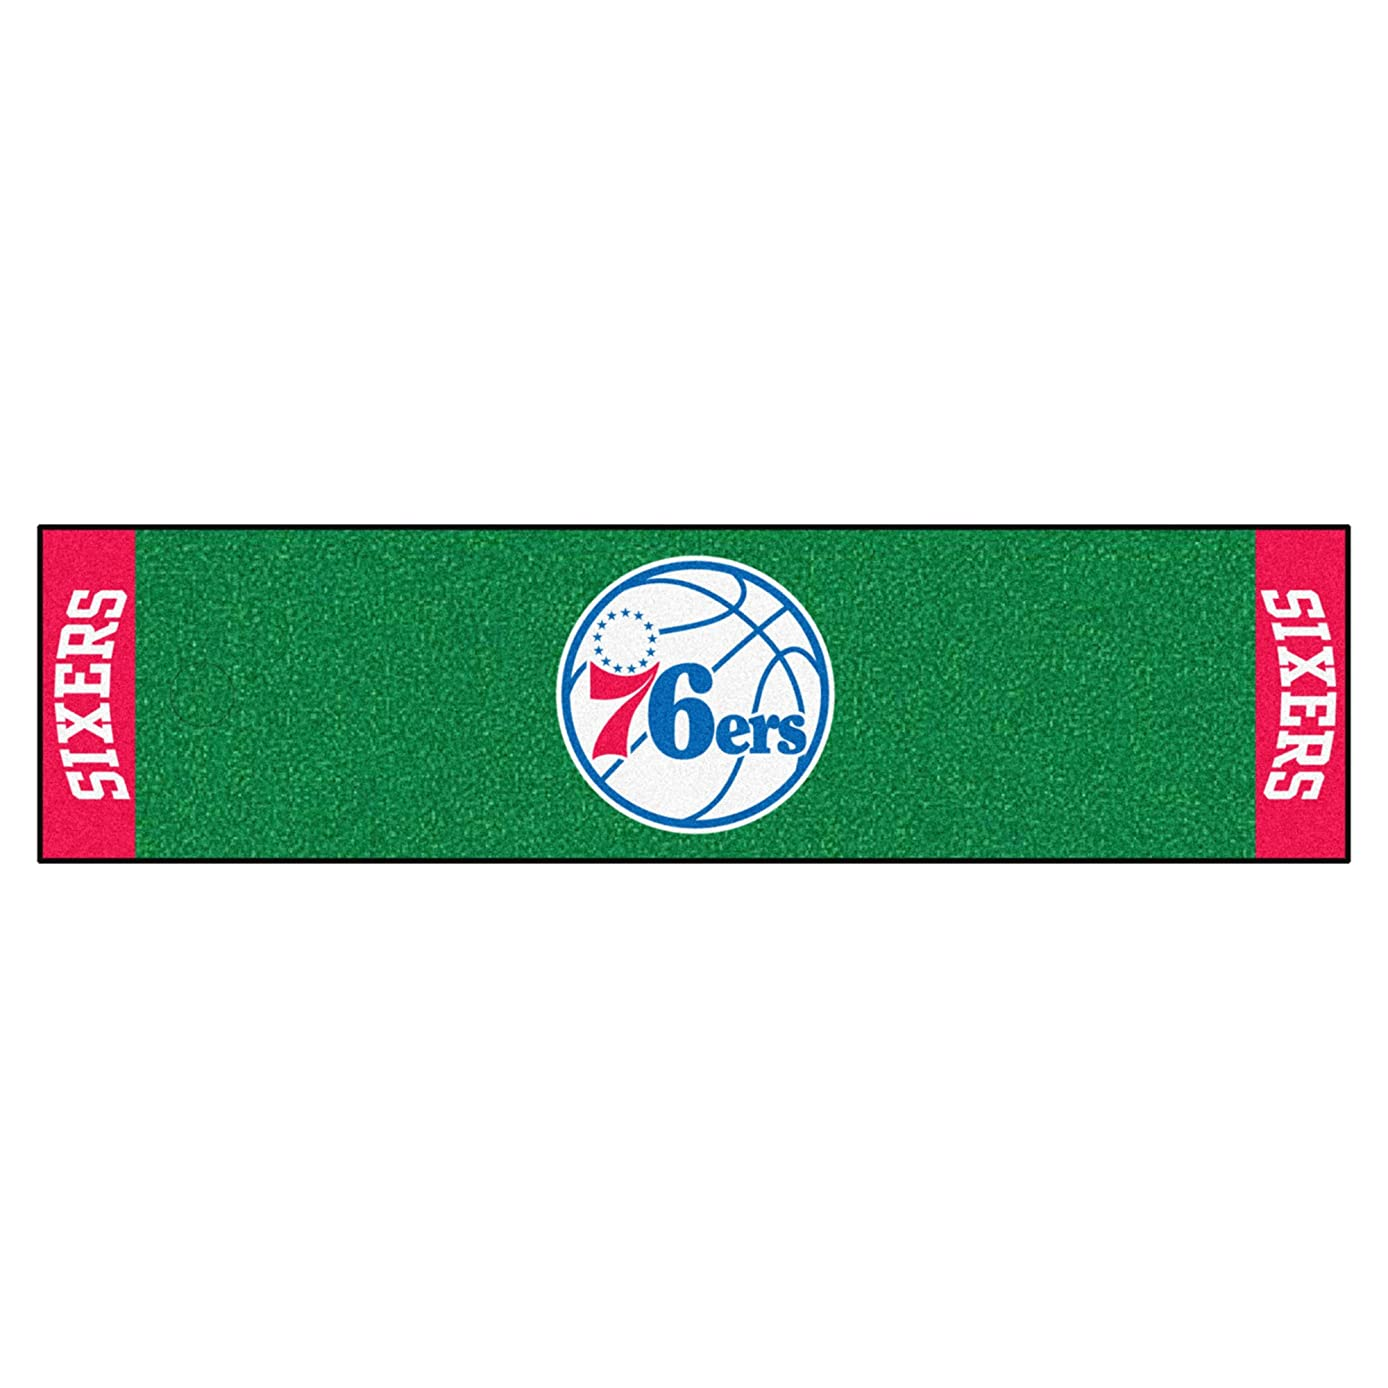 FANMATS NBA Philadelphia 76ers Nylon Face Putting Green Mat